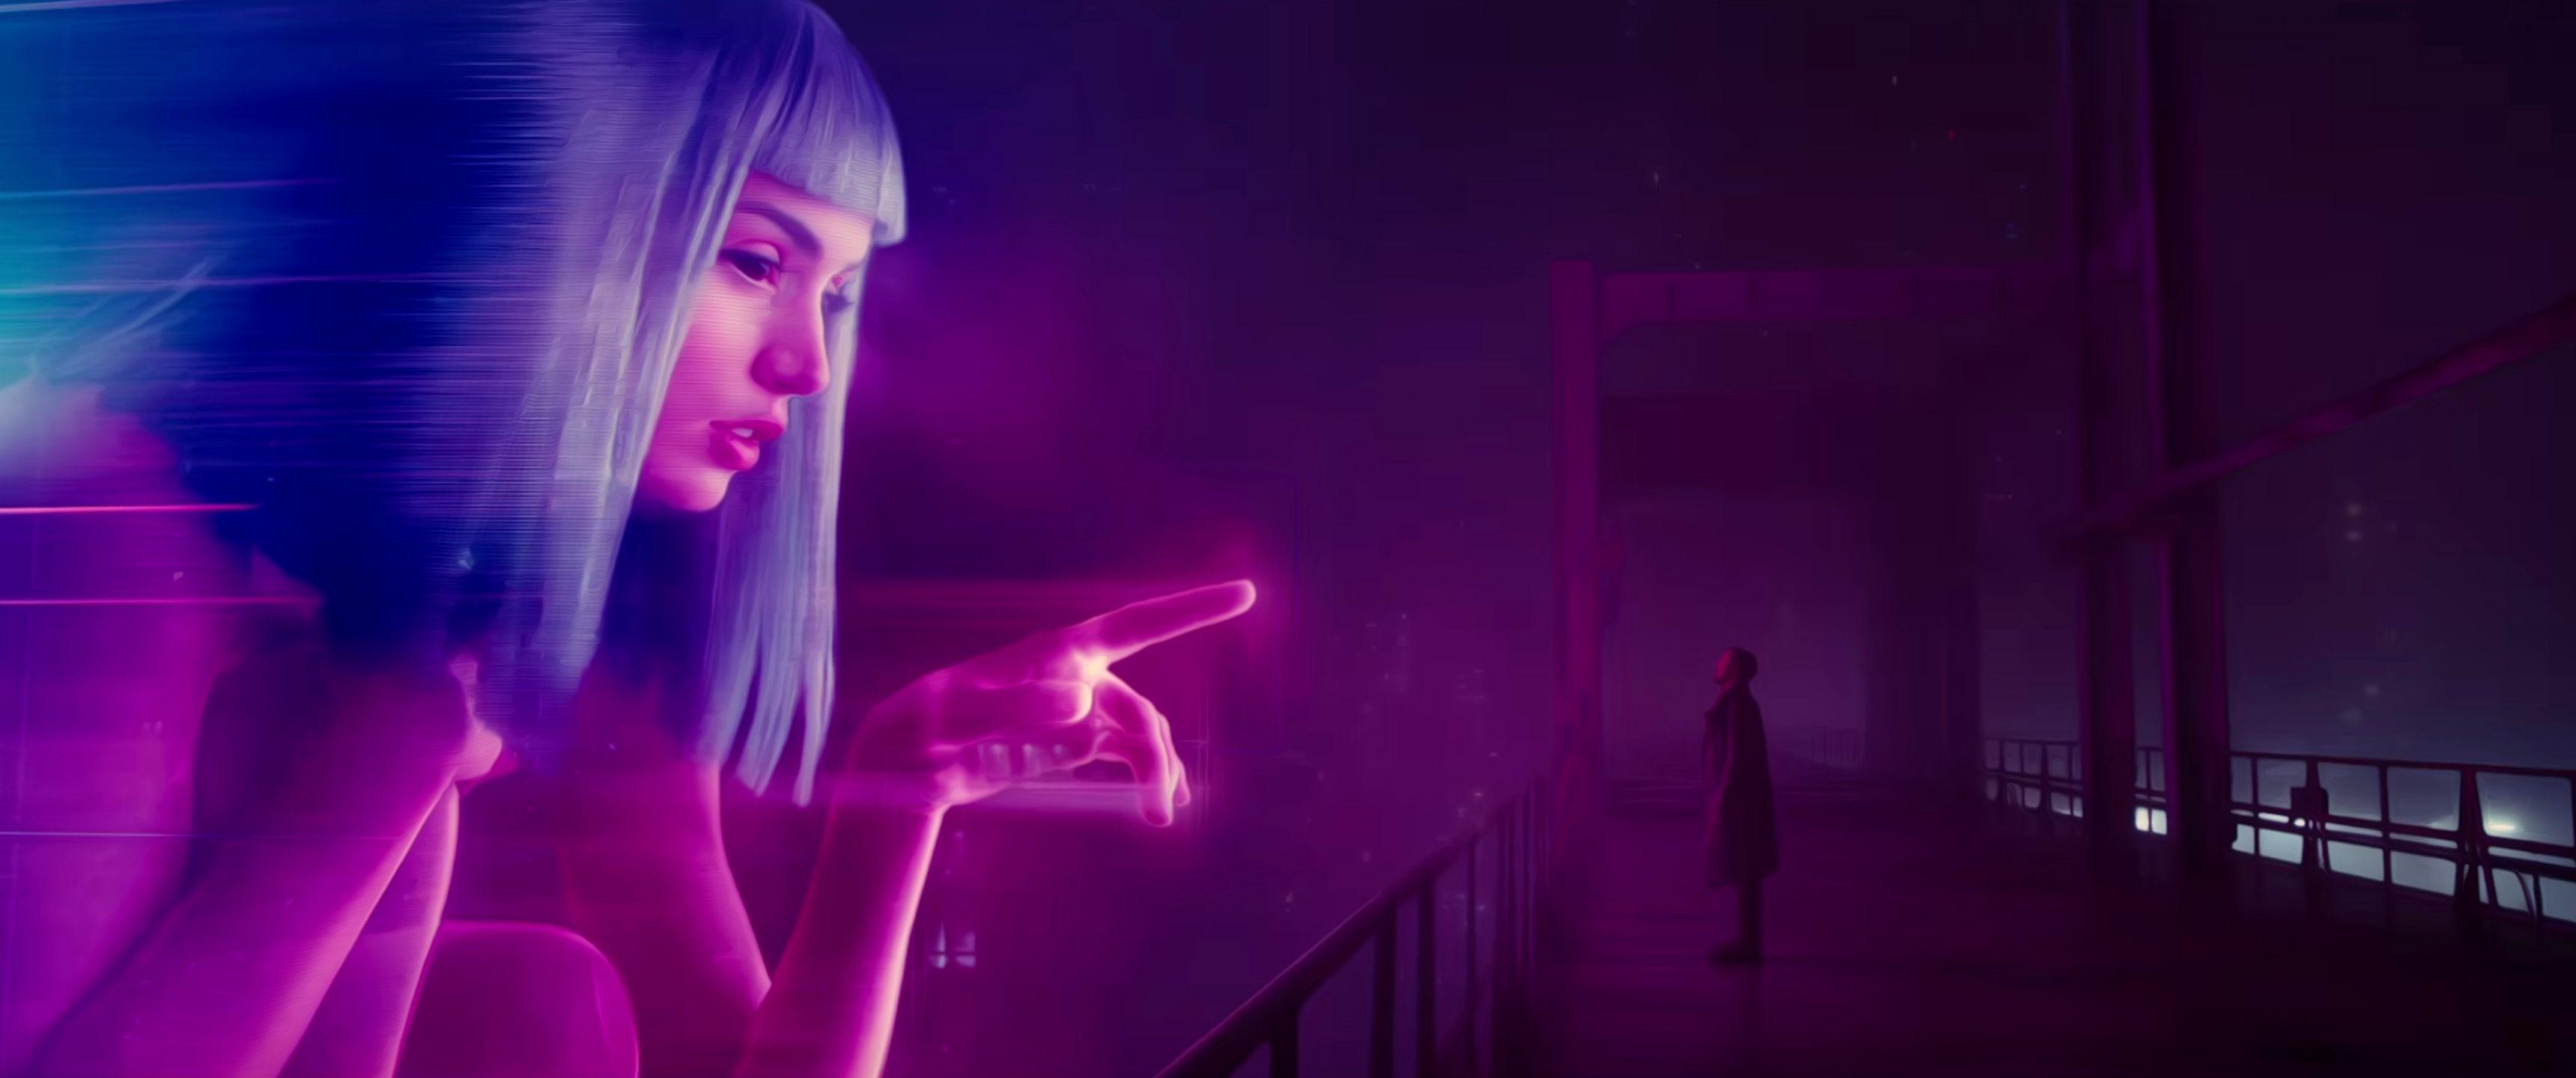 Blade Runner 4k Wallpaper Reddit Ideas Di 2020